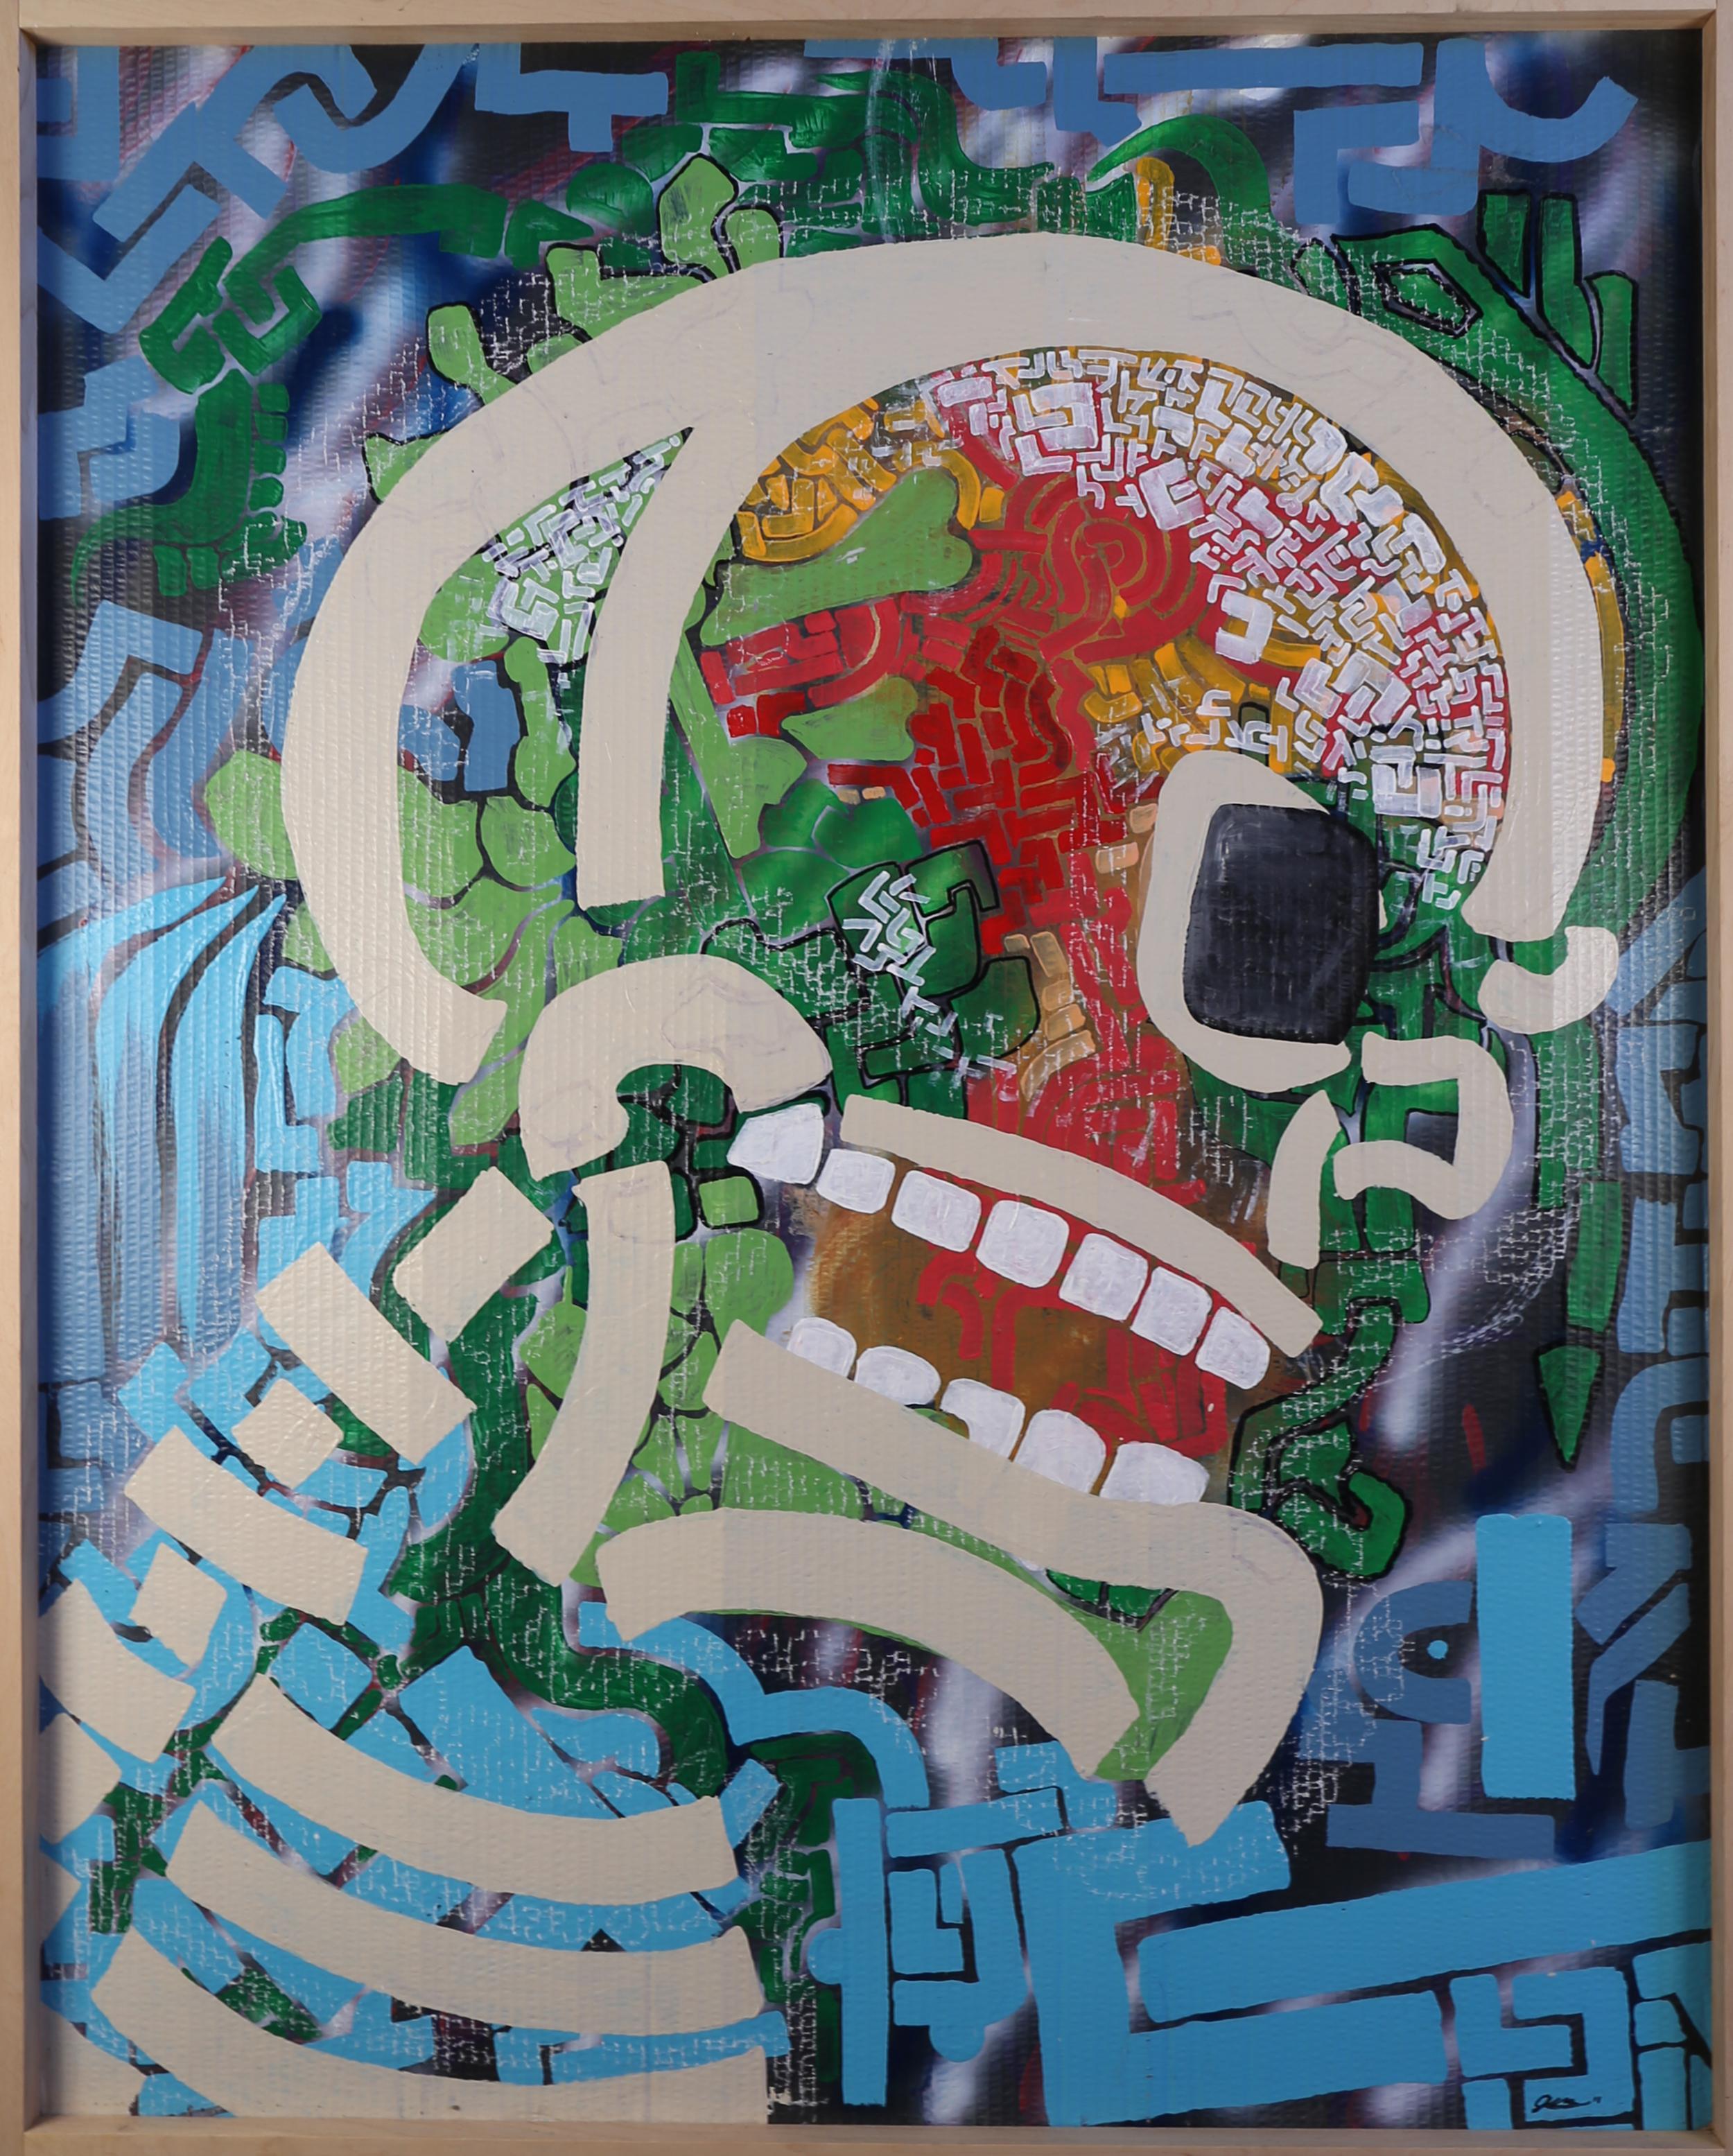 Emergence-julio gonzalez-cardboard-art-mayan.png